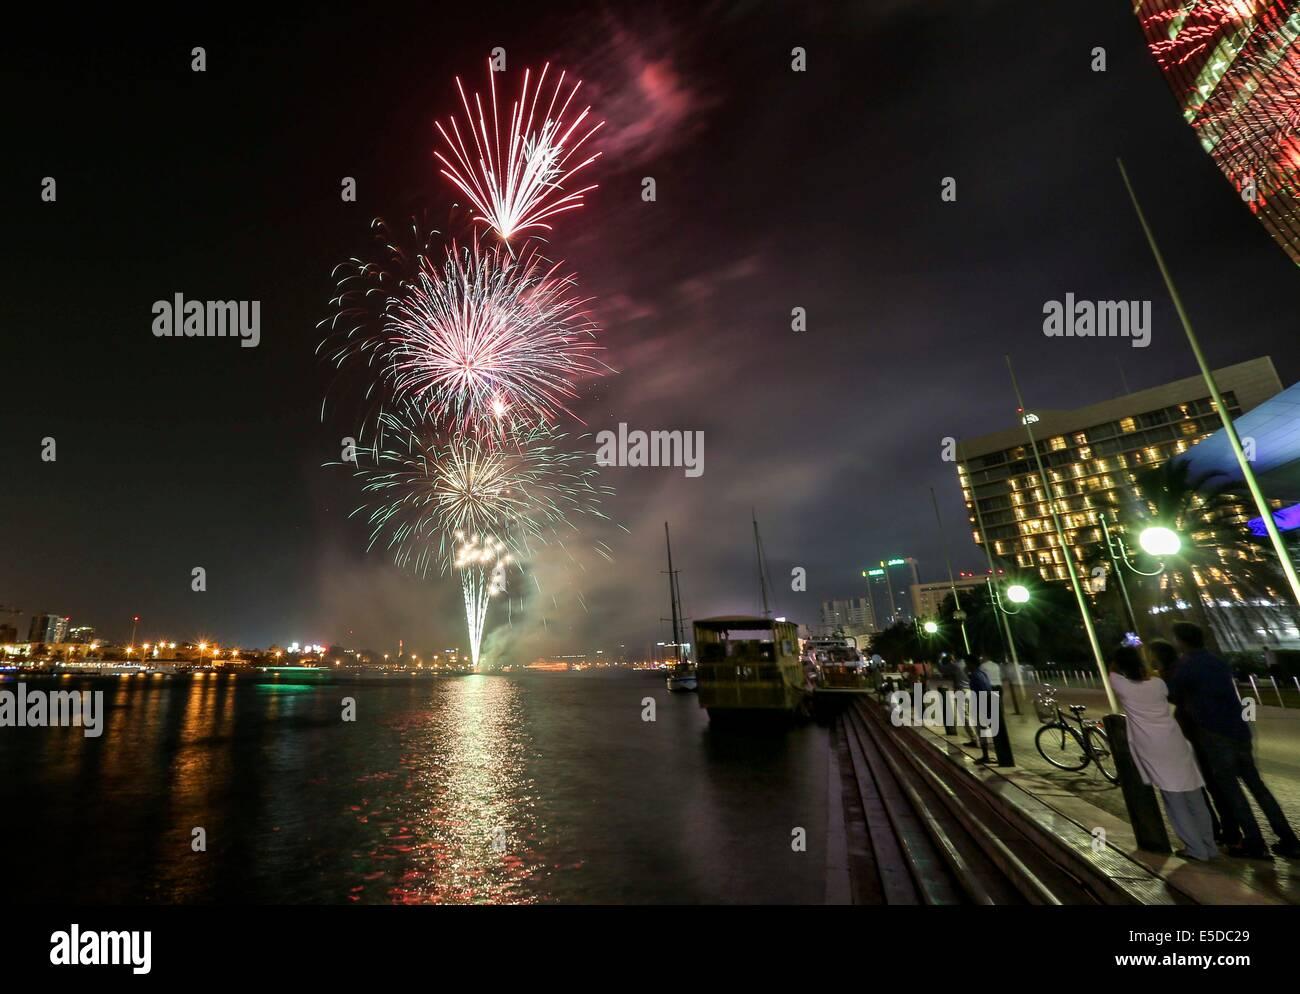 Dubai, United Arab Emirates (UAE). 28th July, 2014. Fireworks are launched at the Dubai Creek to celebrate the Eid Stock Photo